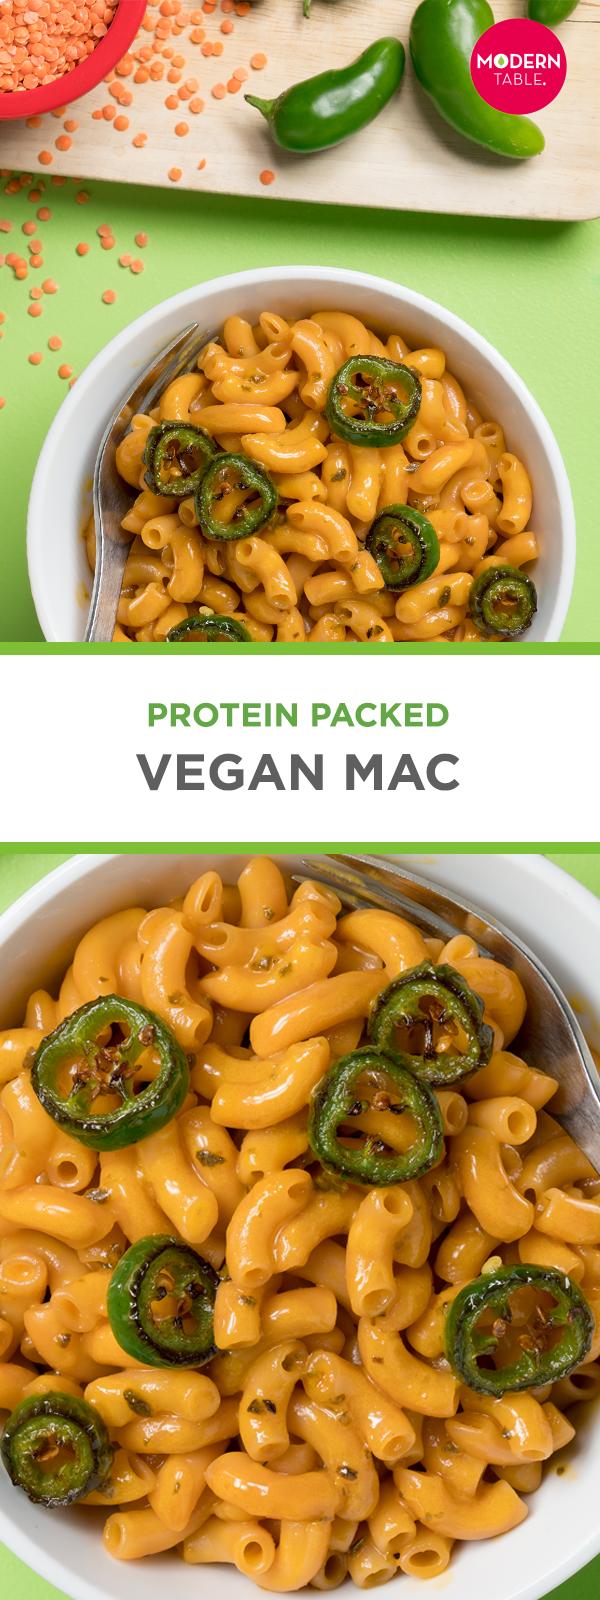 Vegan Mac Vegan Mac Cheese Modern Table Meals Vegan Mac And Cheese Vegetarian Recipes Healthy Recipes